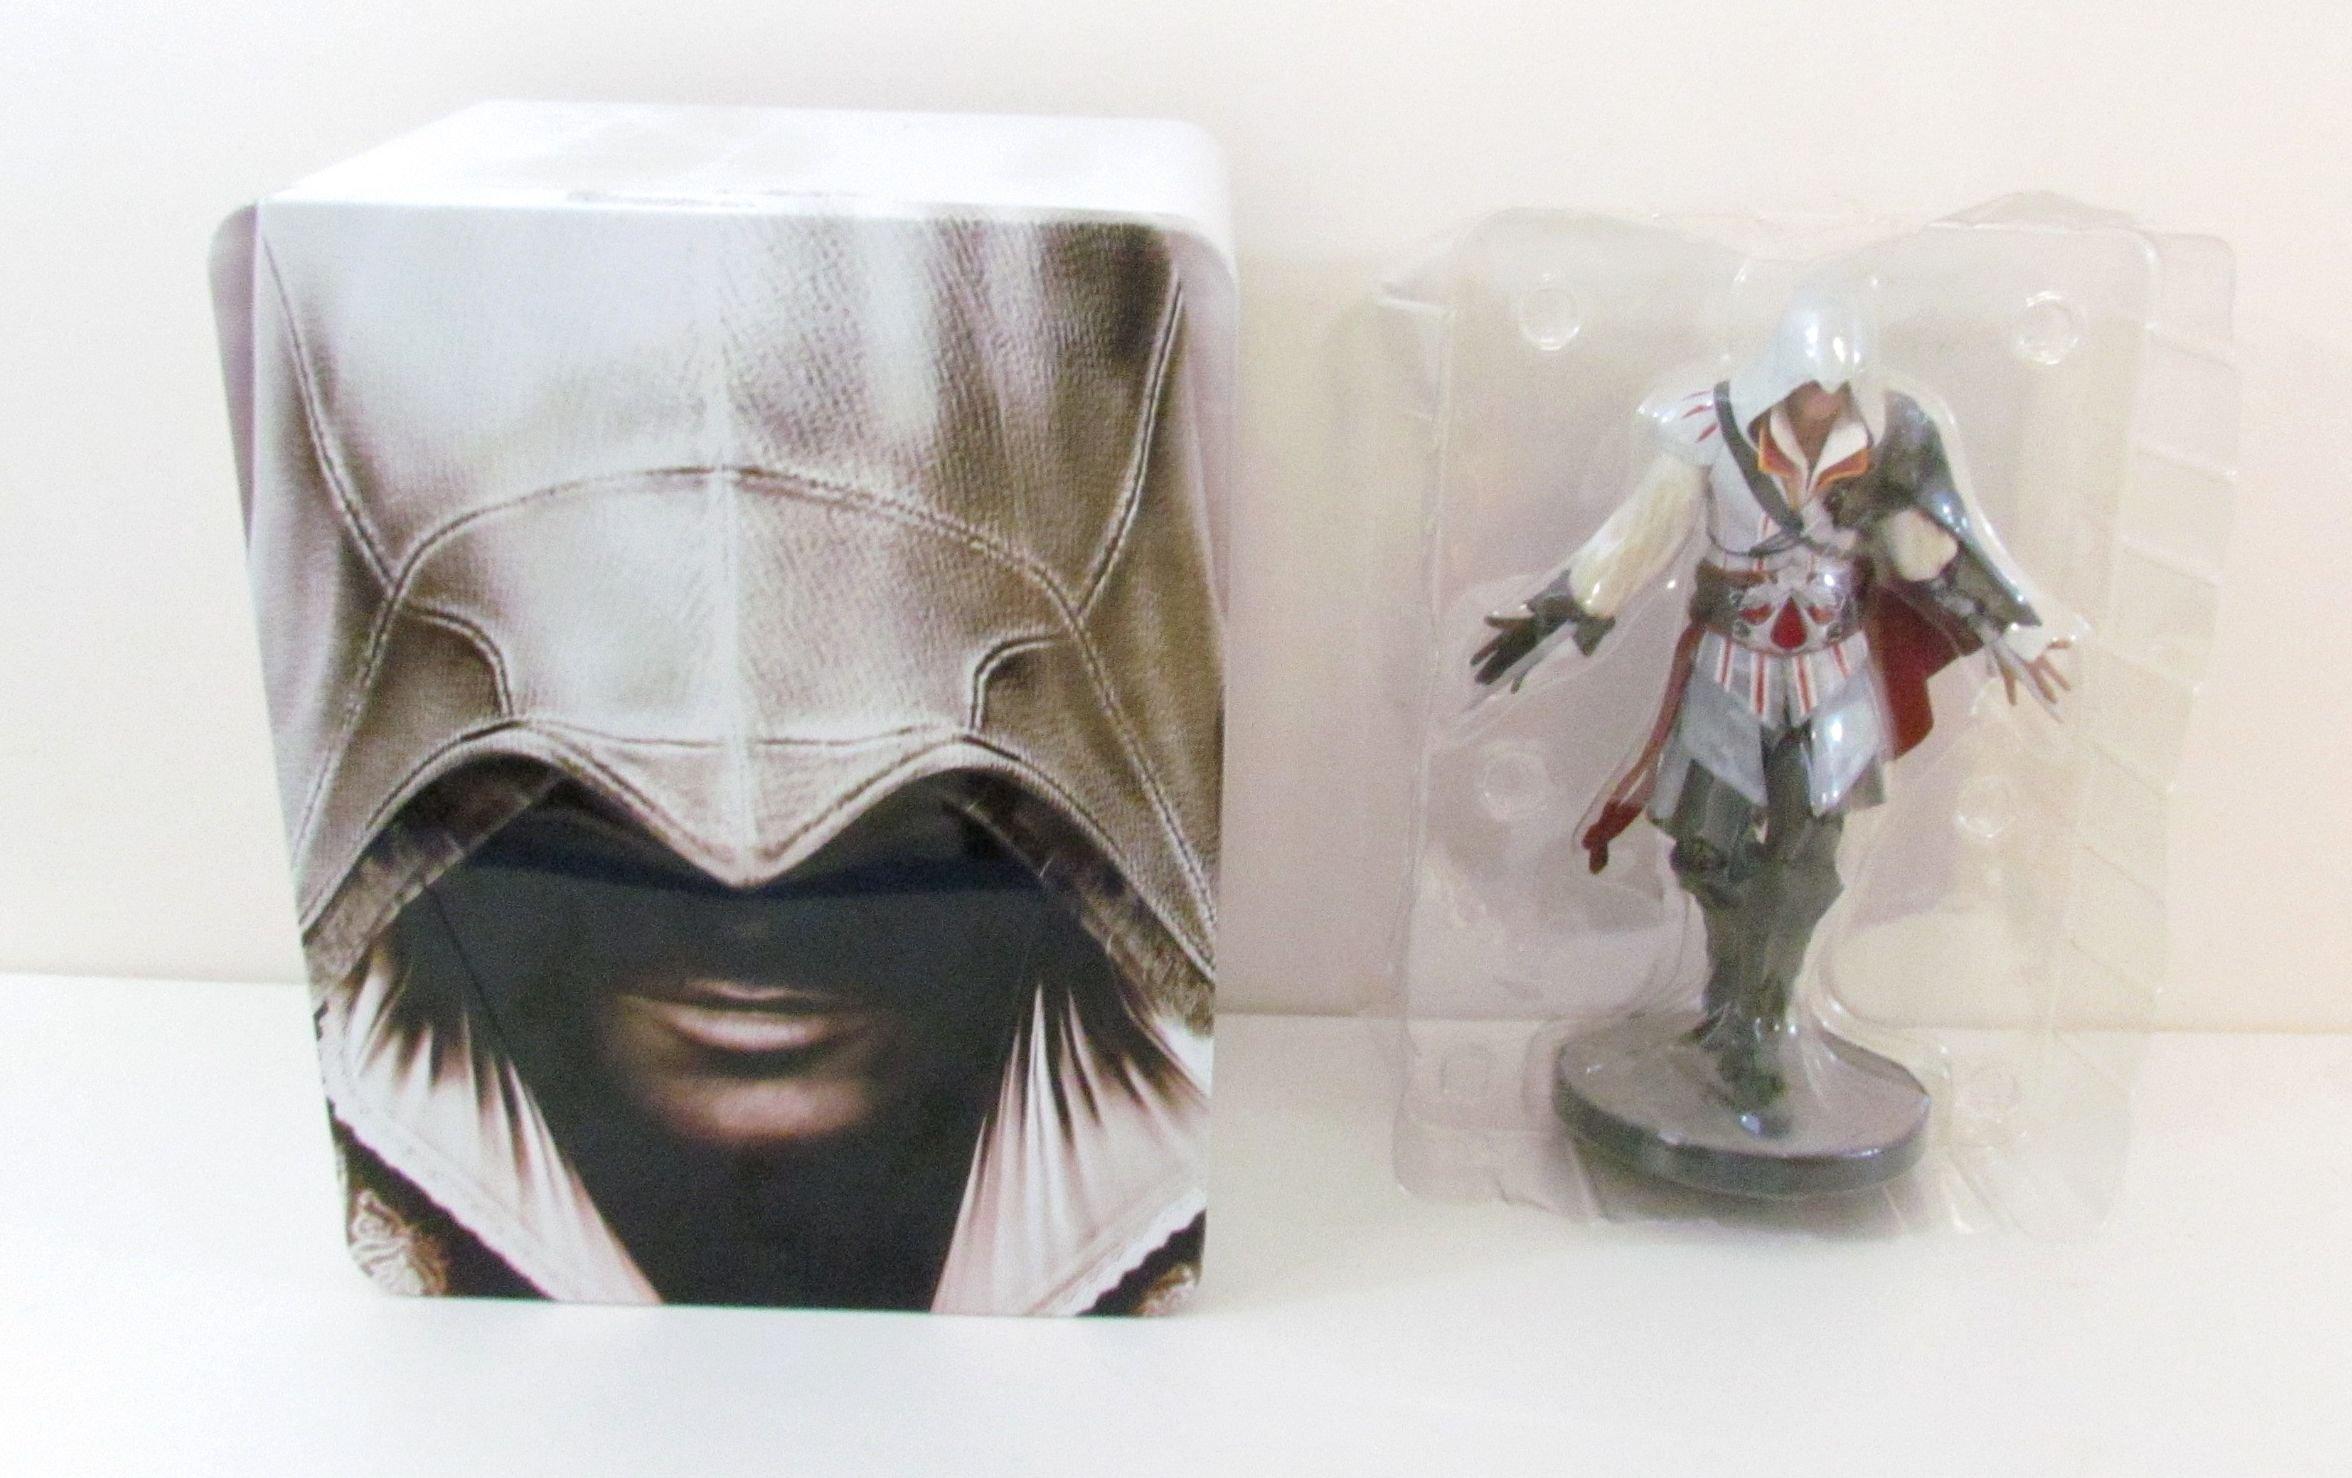 Assassin's Creed 2 Master Assassin Edition Ezio Figurine